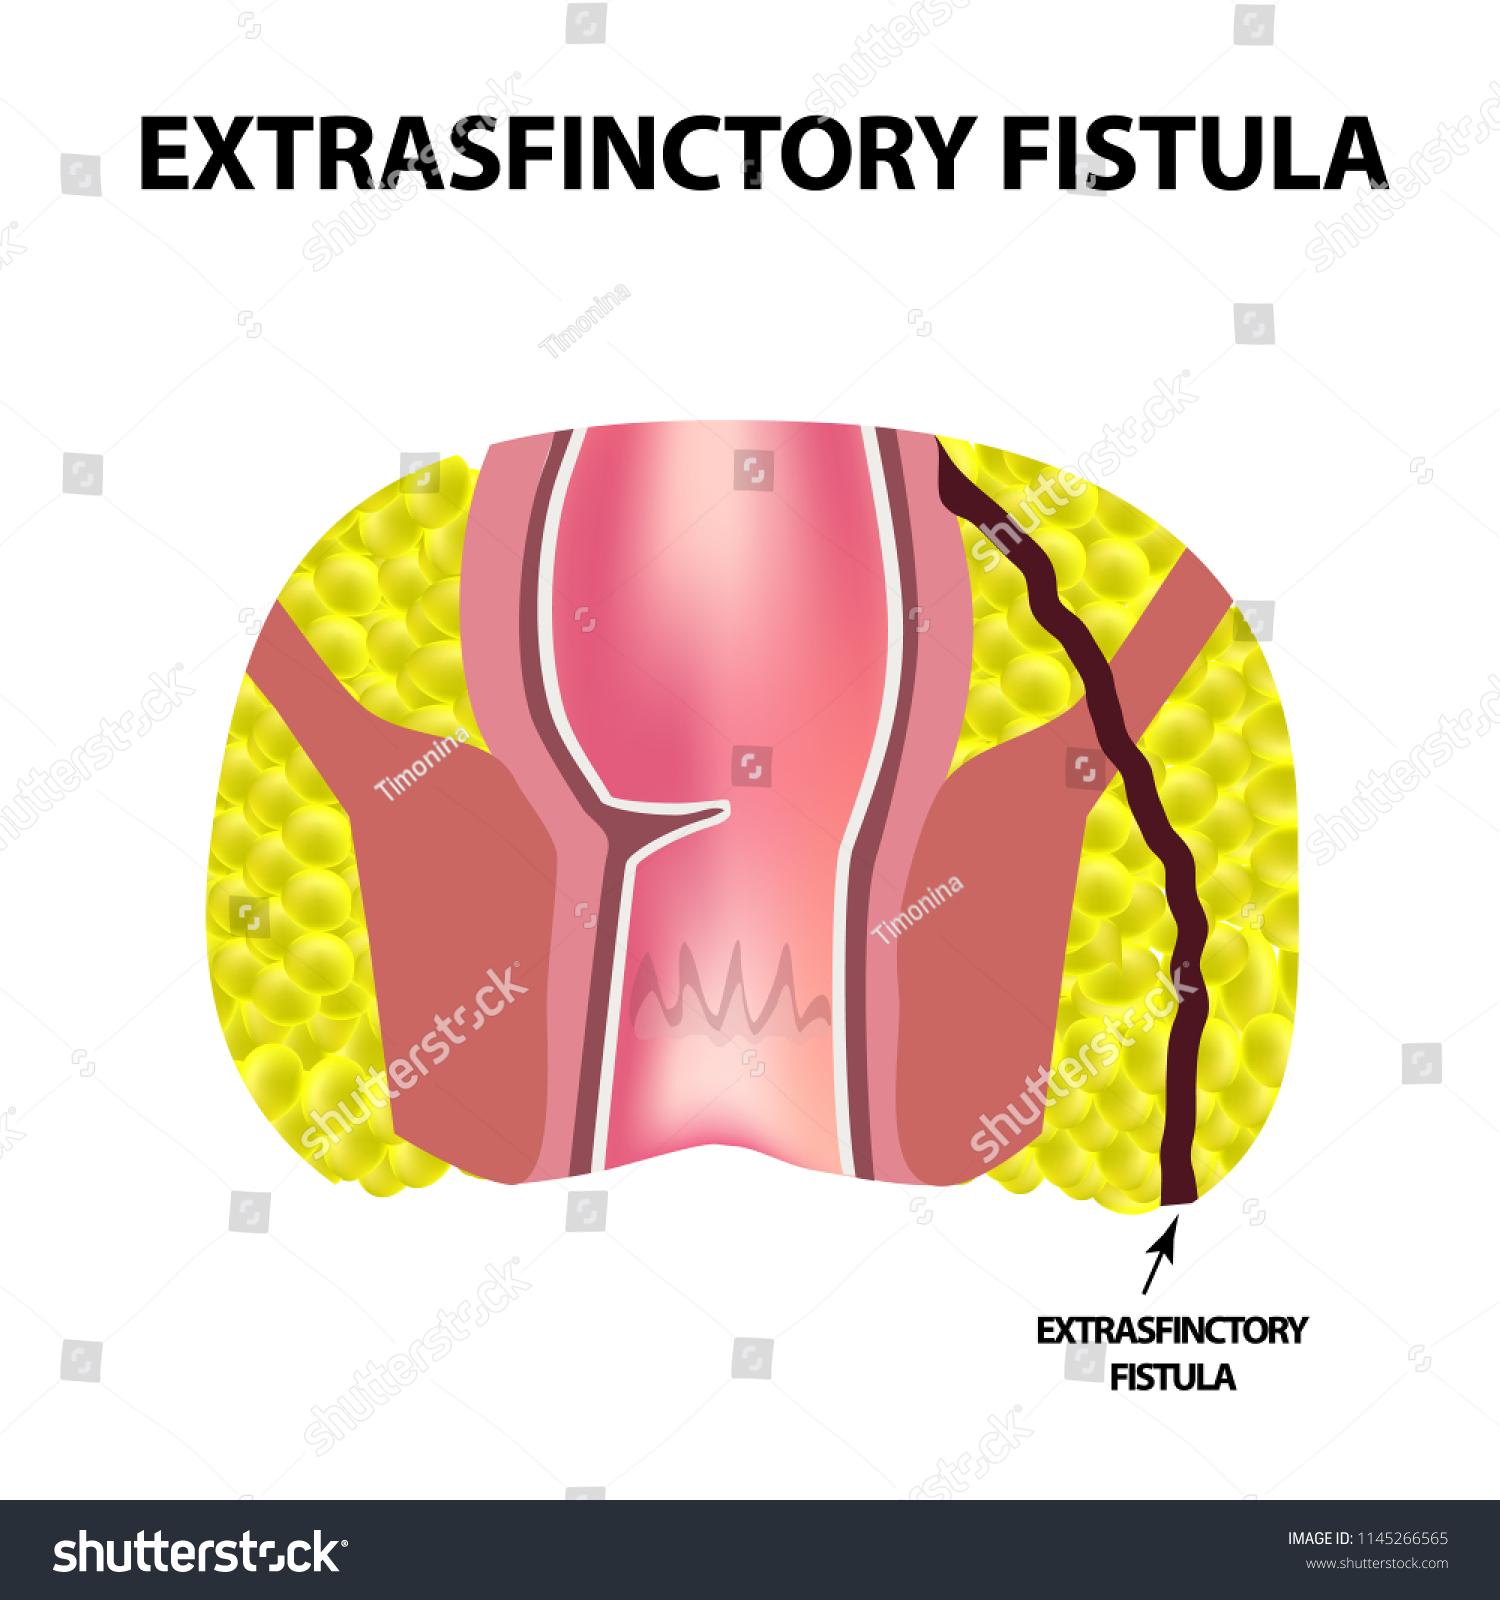 Royalty Free Stock Illustration Of Types Fistulas Rectum